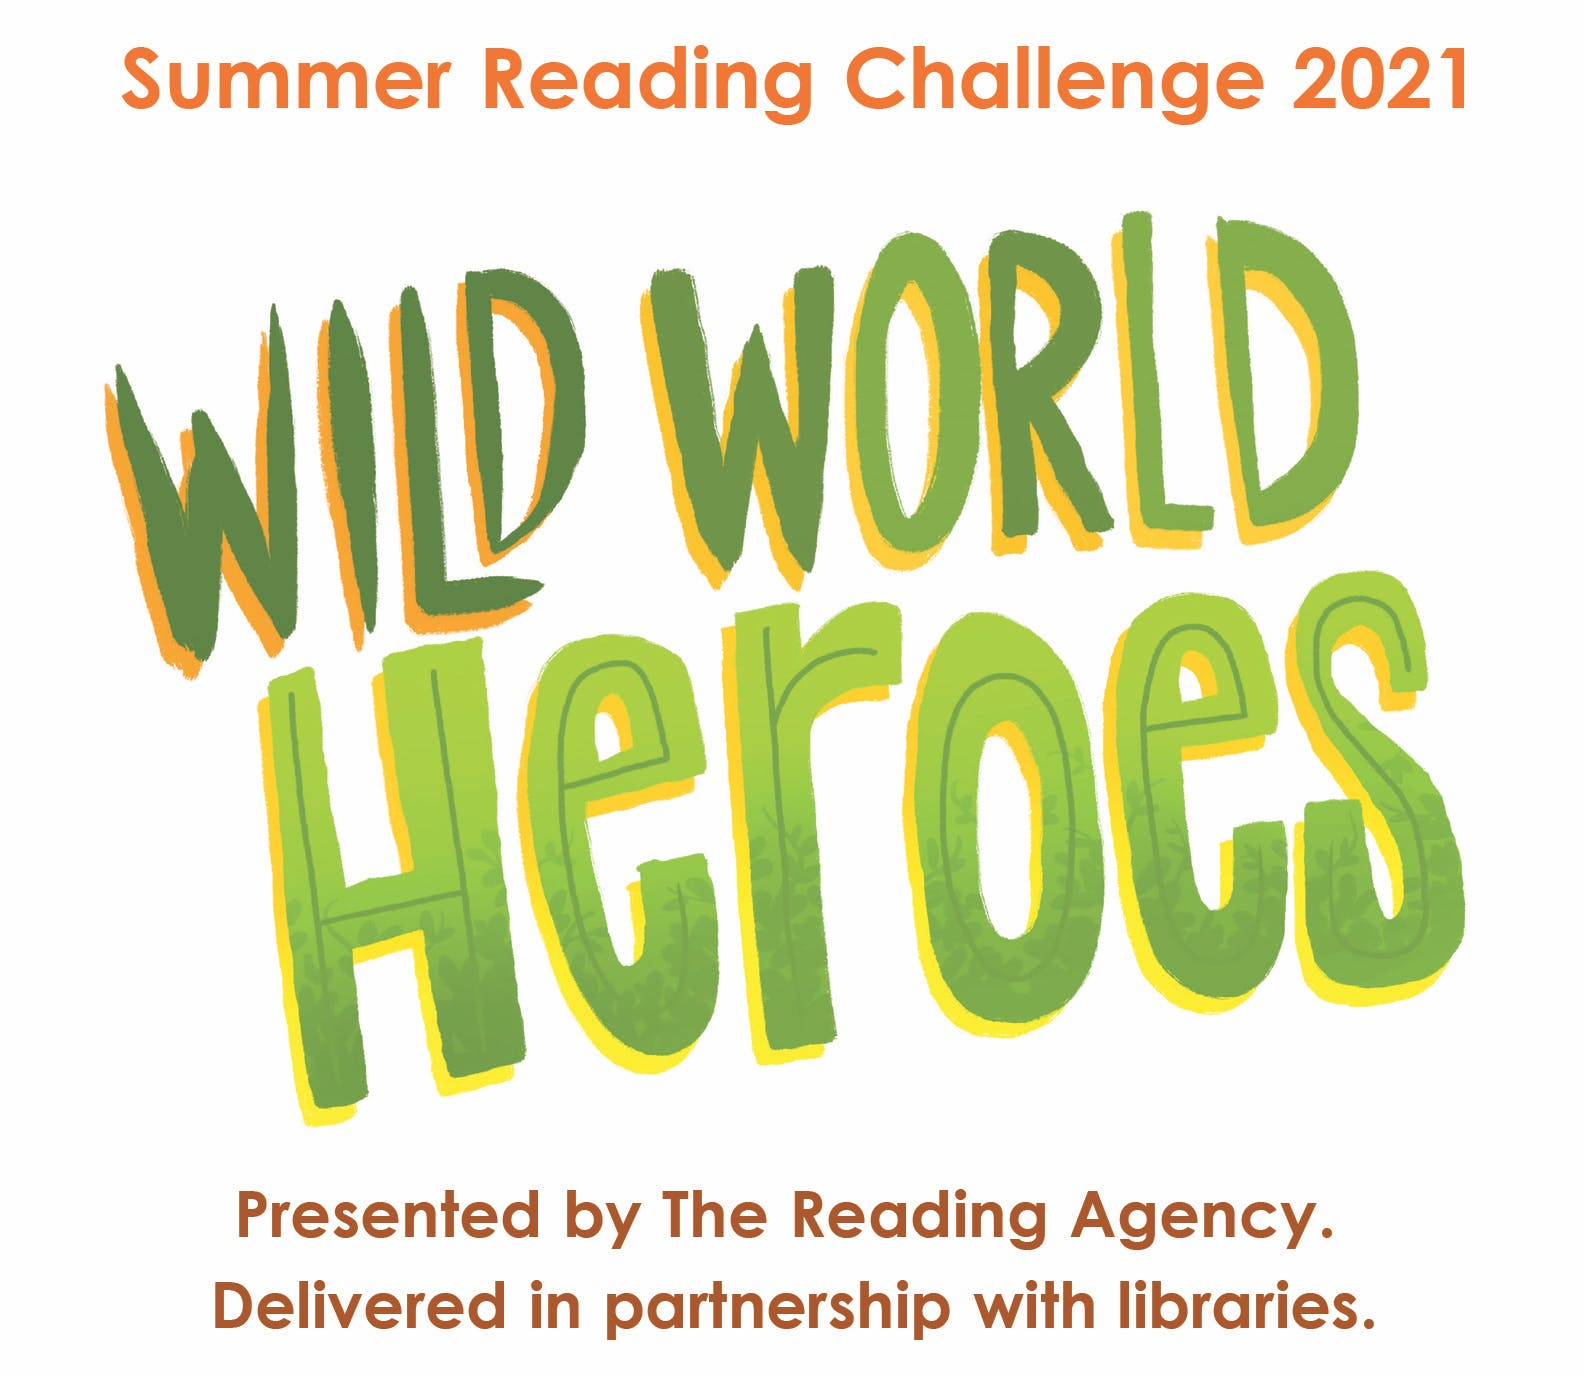 Summer Reading Challenge logo Wild World Heroes